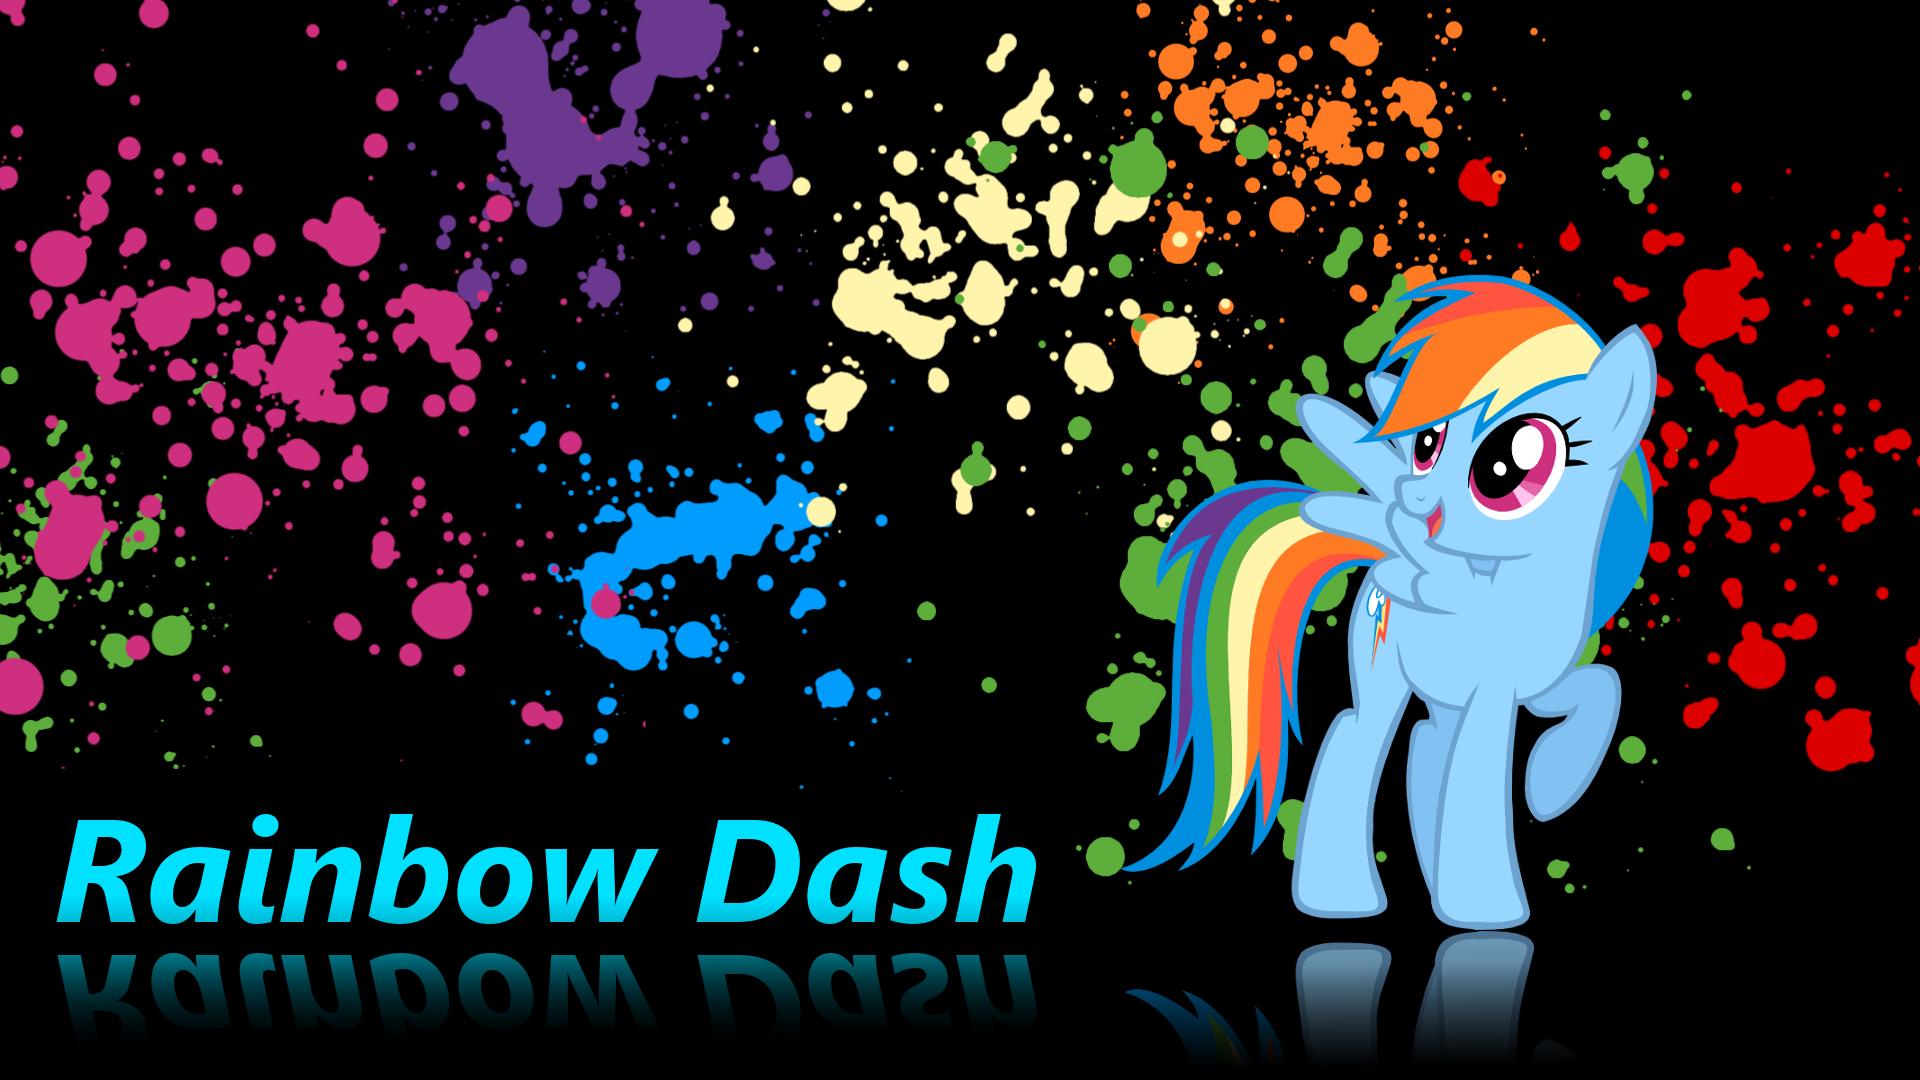 Rainbow Dash wallpaper v.2 by XVanilla-TwilightX